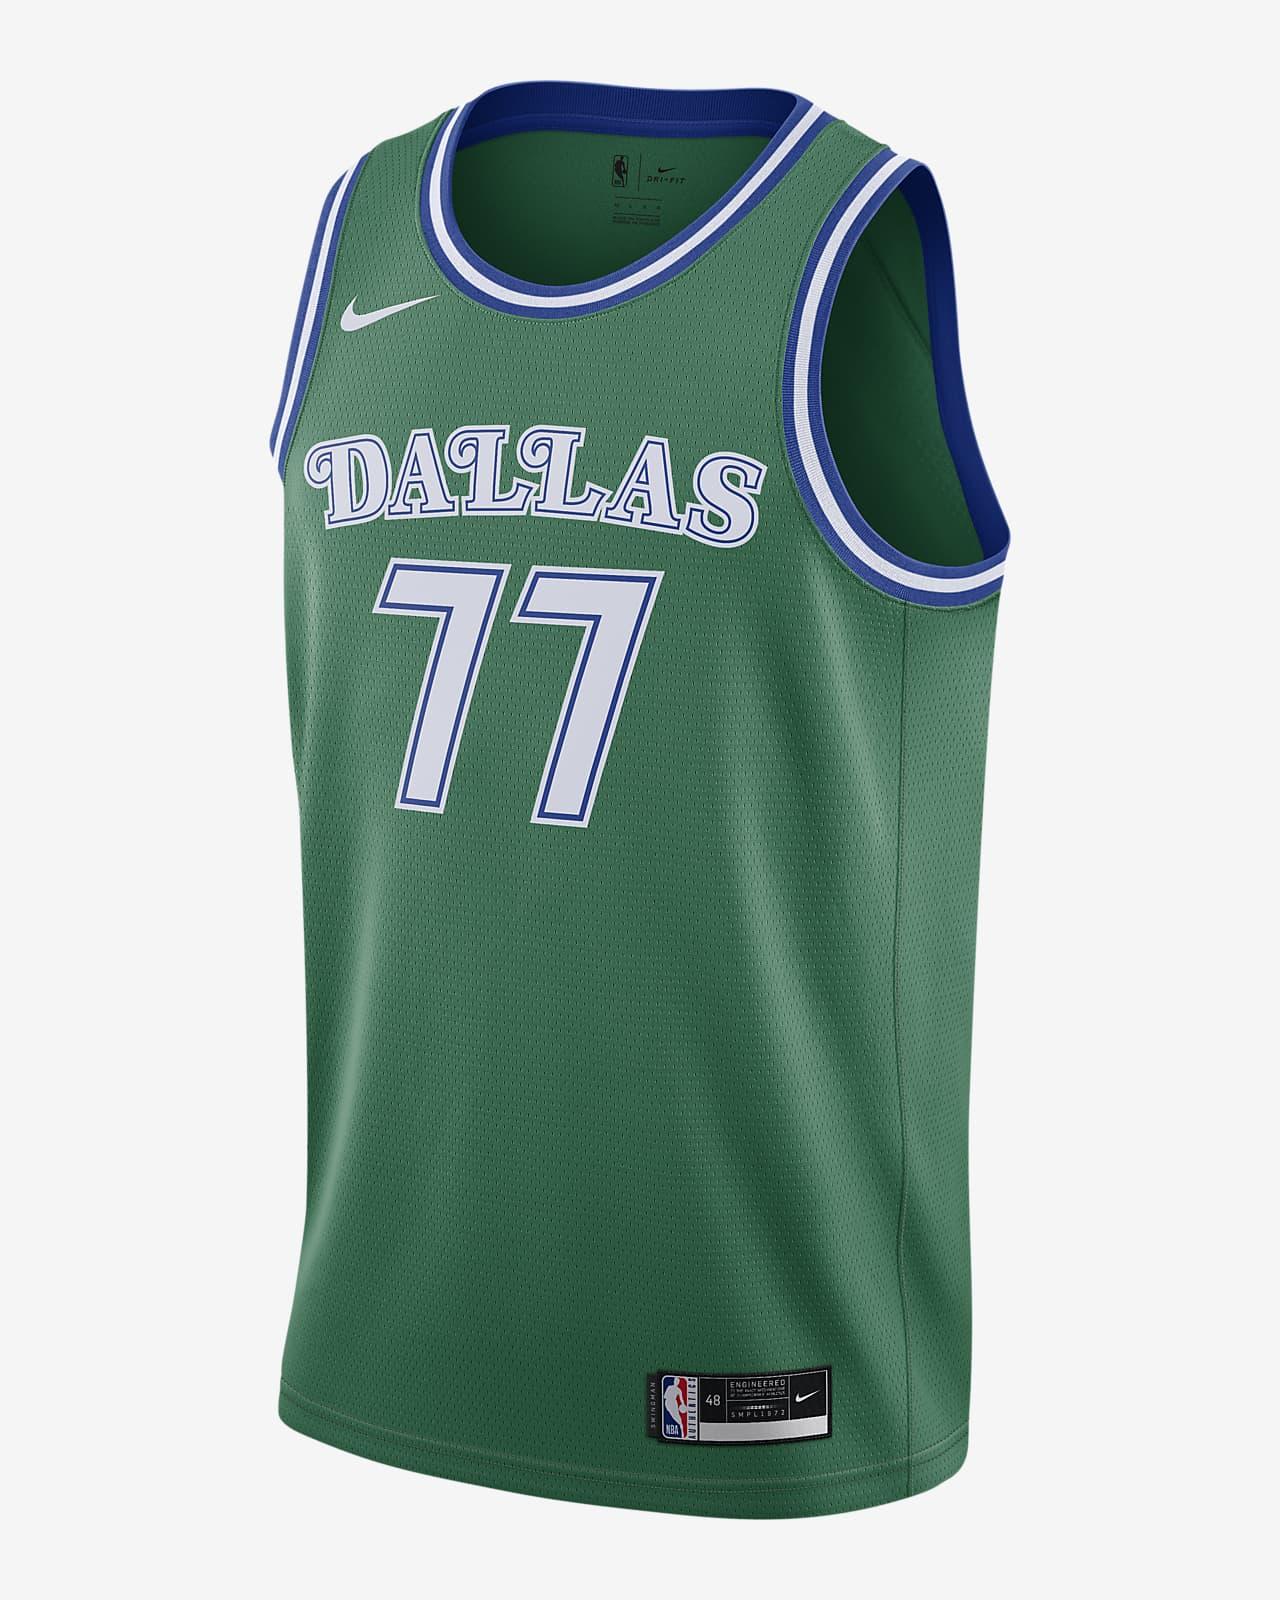 Maillot Nike NBA Swingman Dallas Mavericks Classic Edition 2020